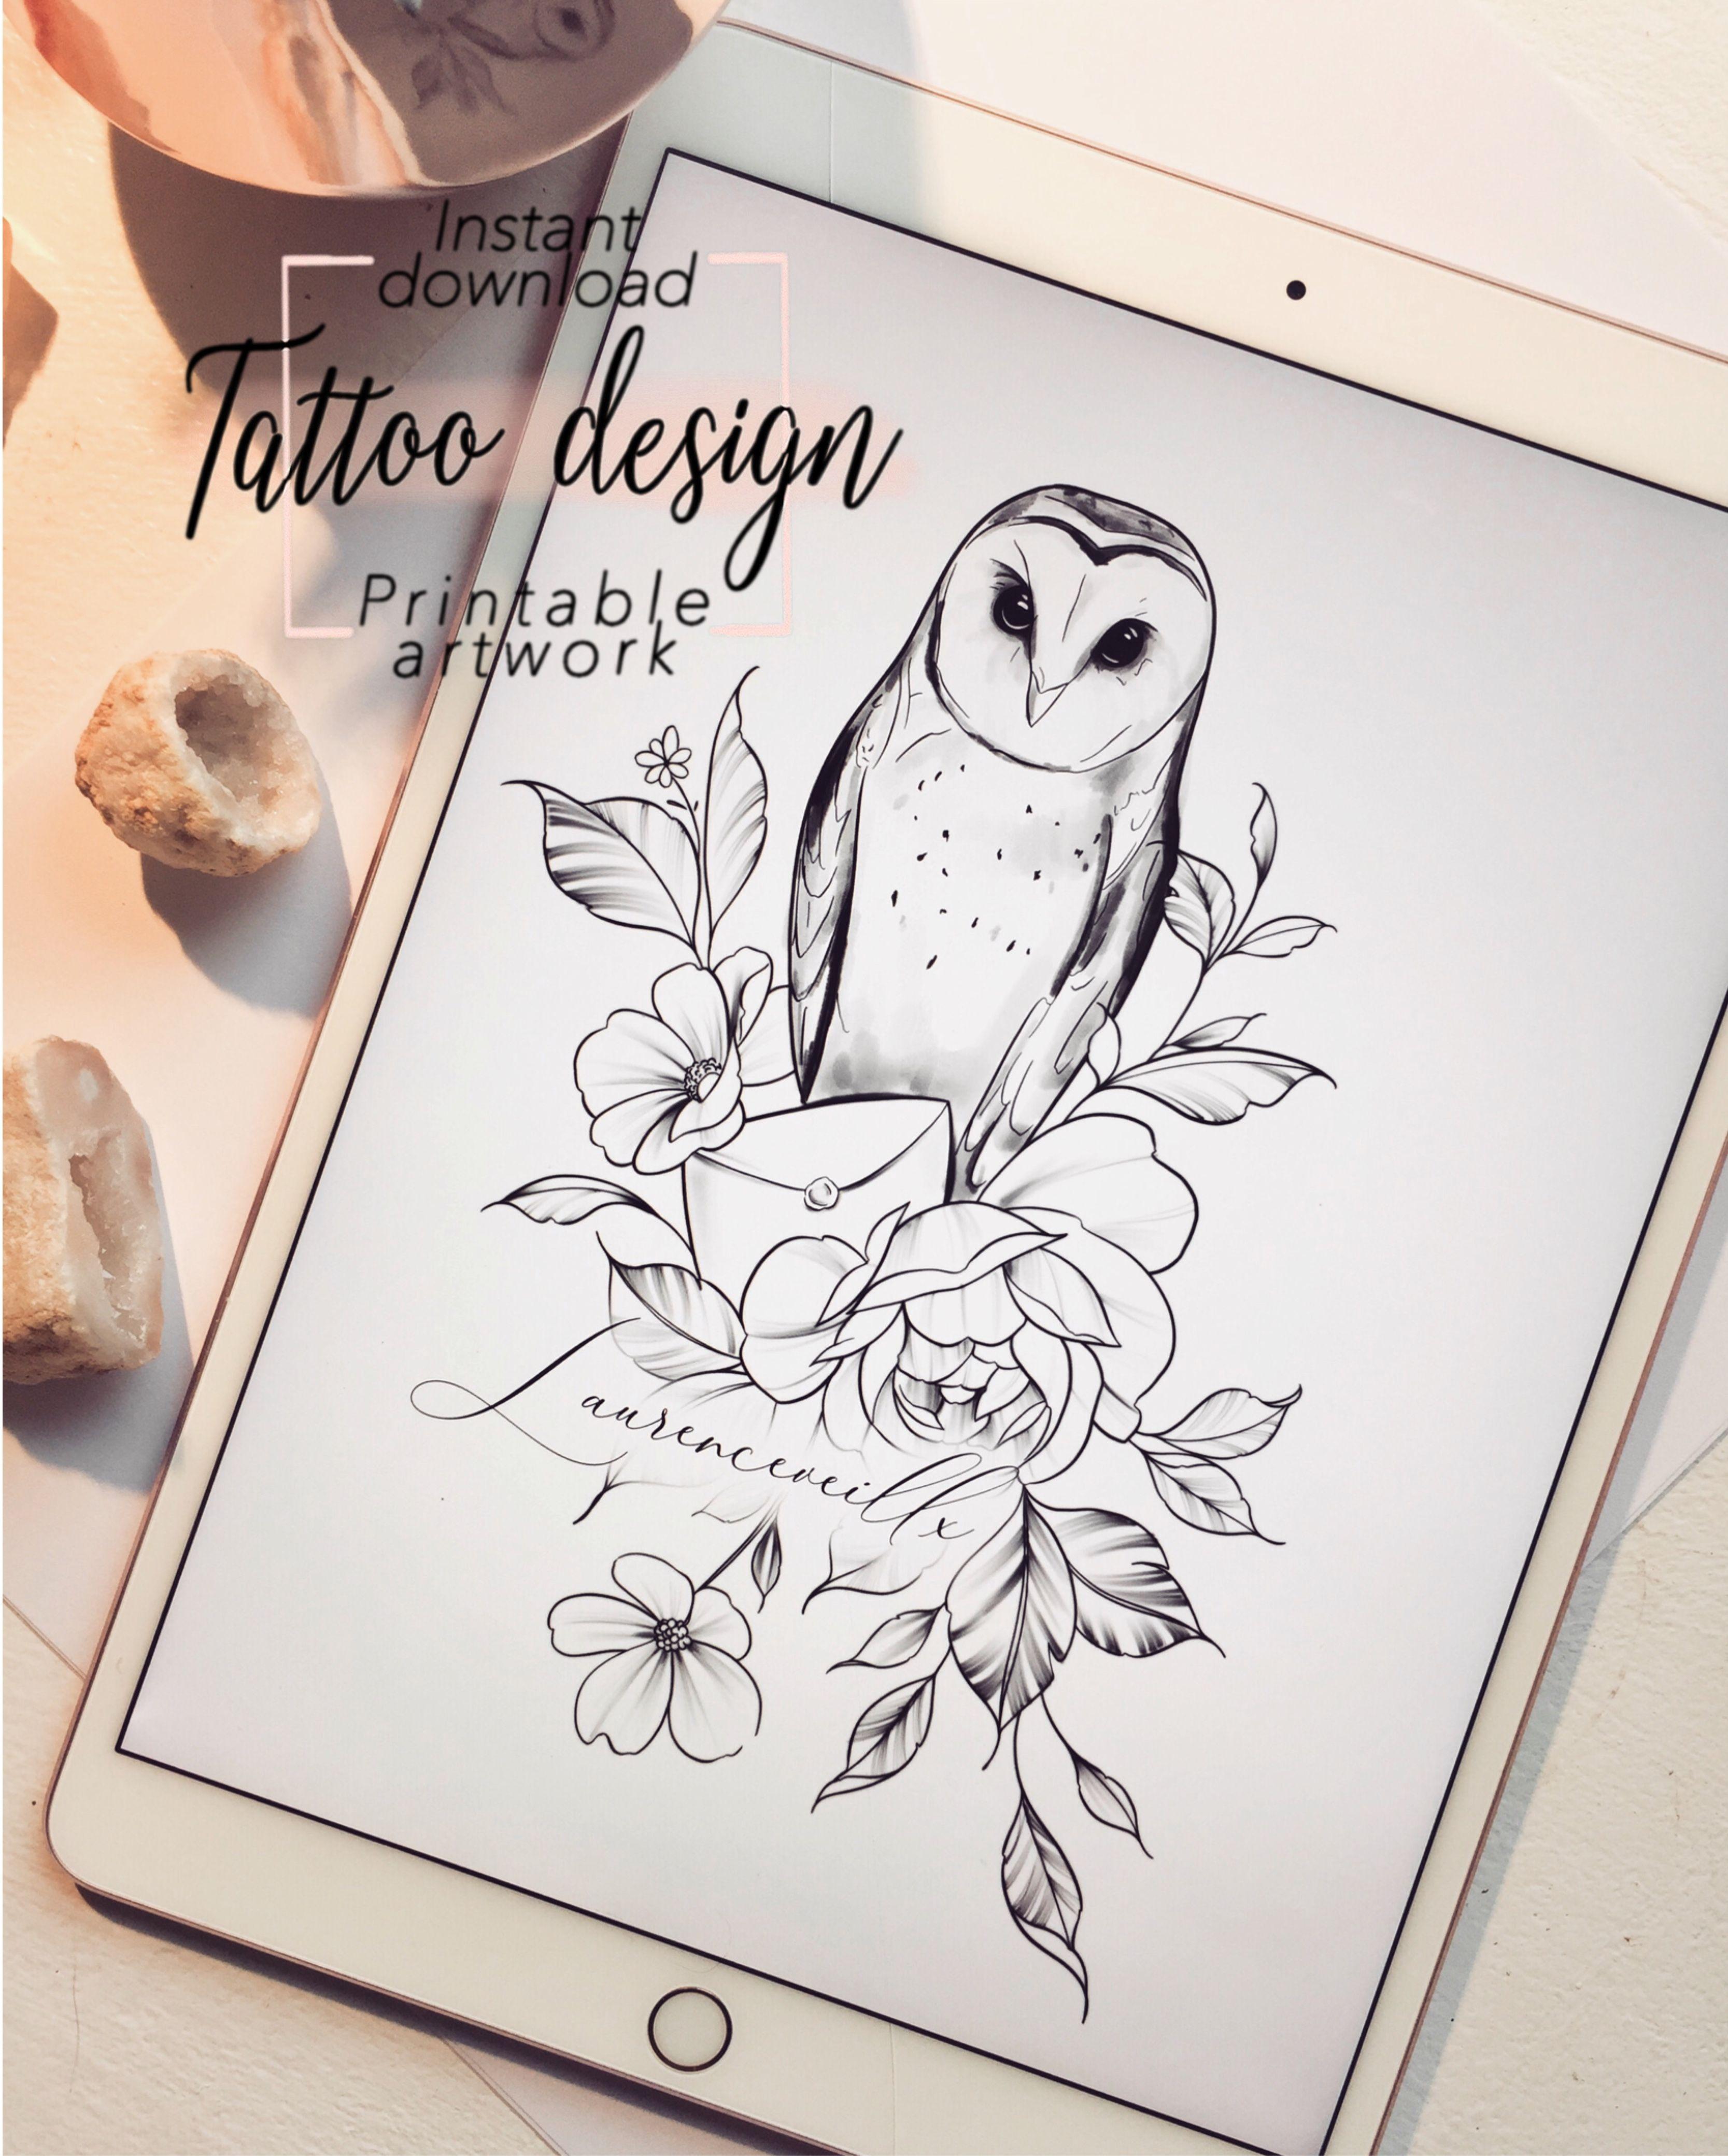 Owl Flowers Tattoo Design For Sale Harry Potter Feminine Tattoo Available On Etsy Owl Tattoo Design Flower Tattoo Designs Feminine Tattoos